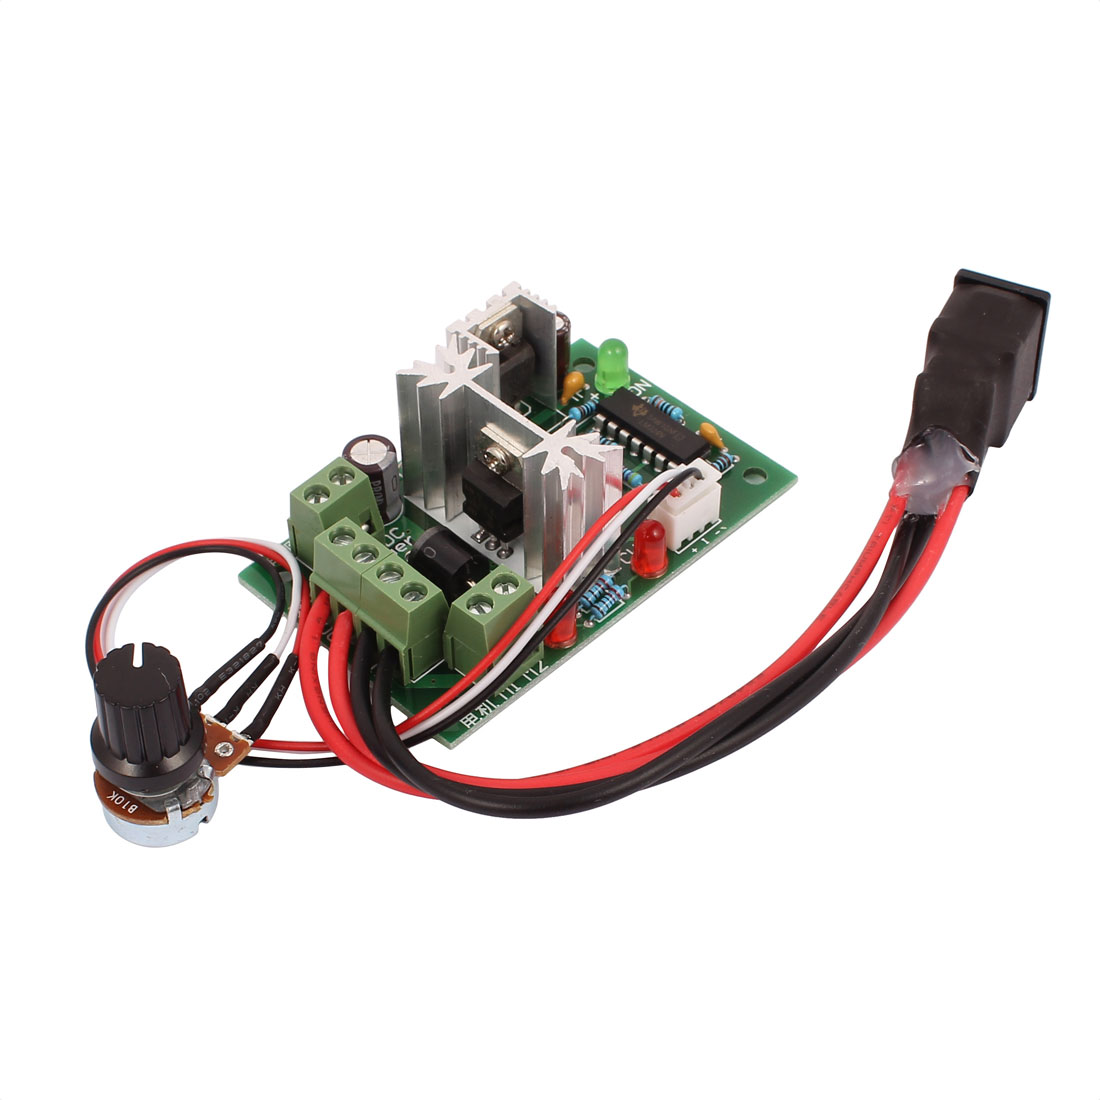 10-30V 120W PWM DC Motor Speed Regulator Controller Forward / Reverse Switch